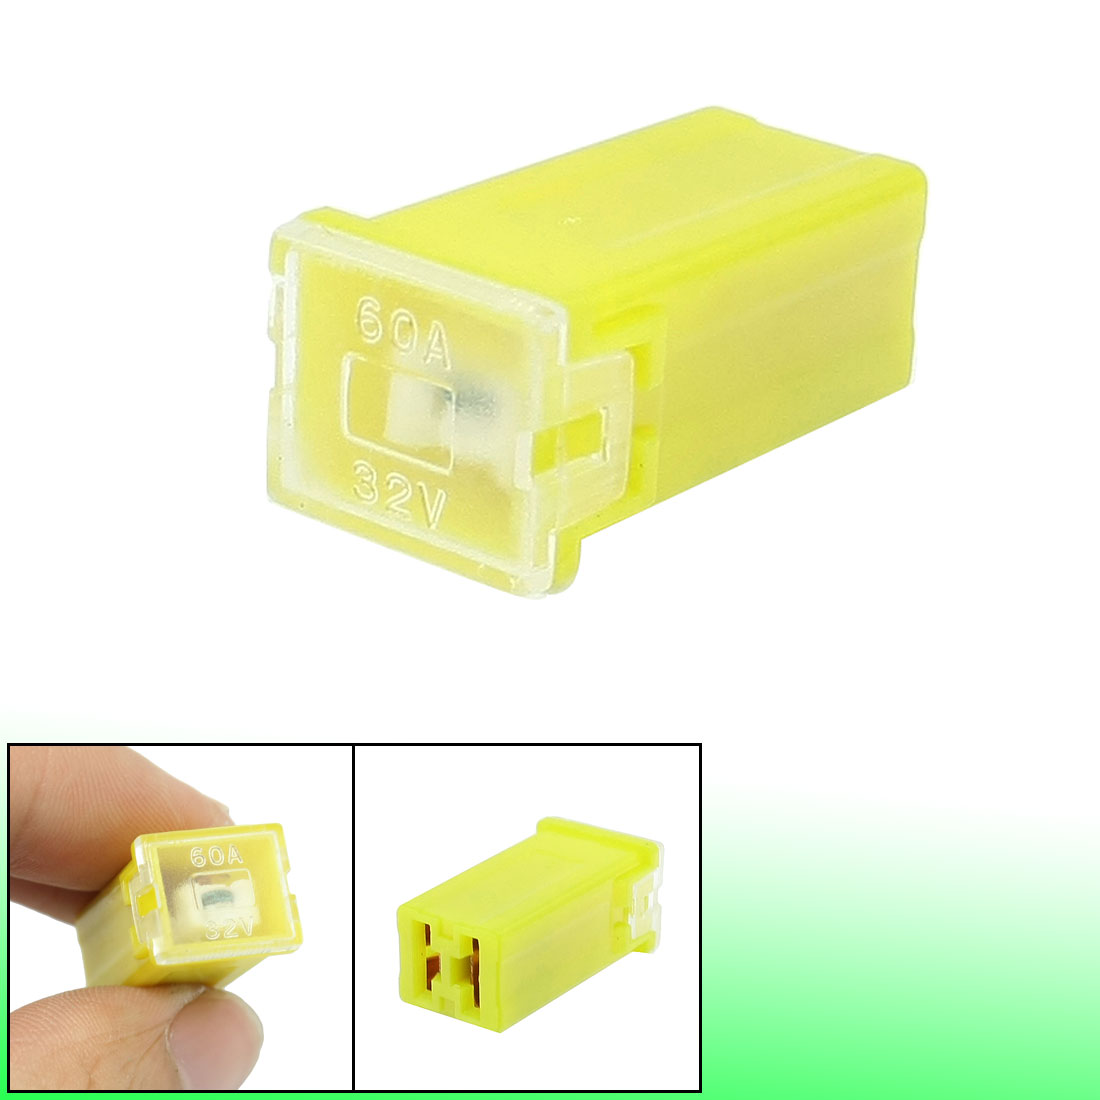 uxcell Automotive Mini Cartridge Fuse 32V 30A Female J Case Box for Car Truck SUV Vehicle